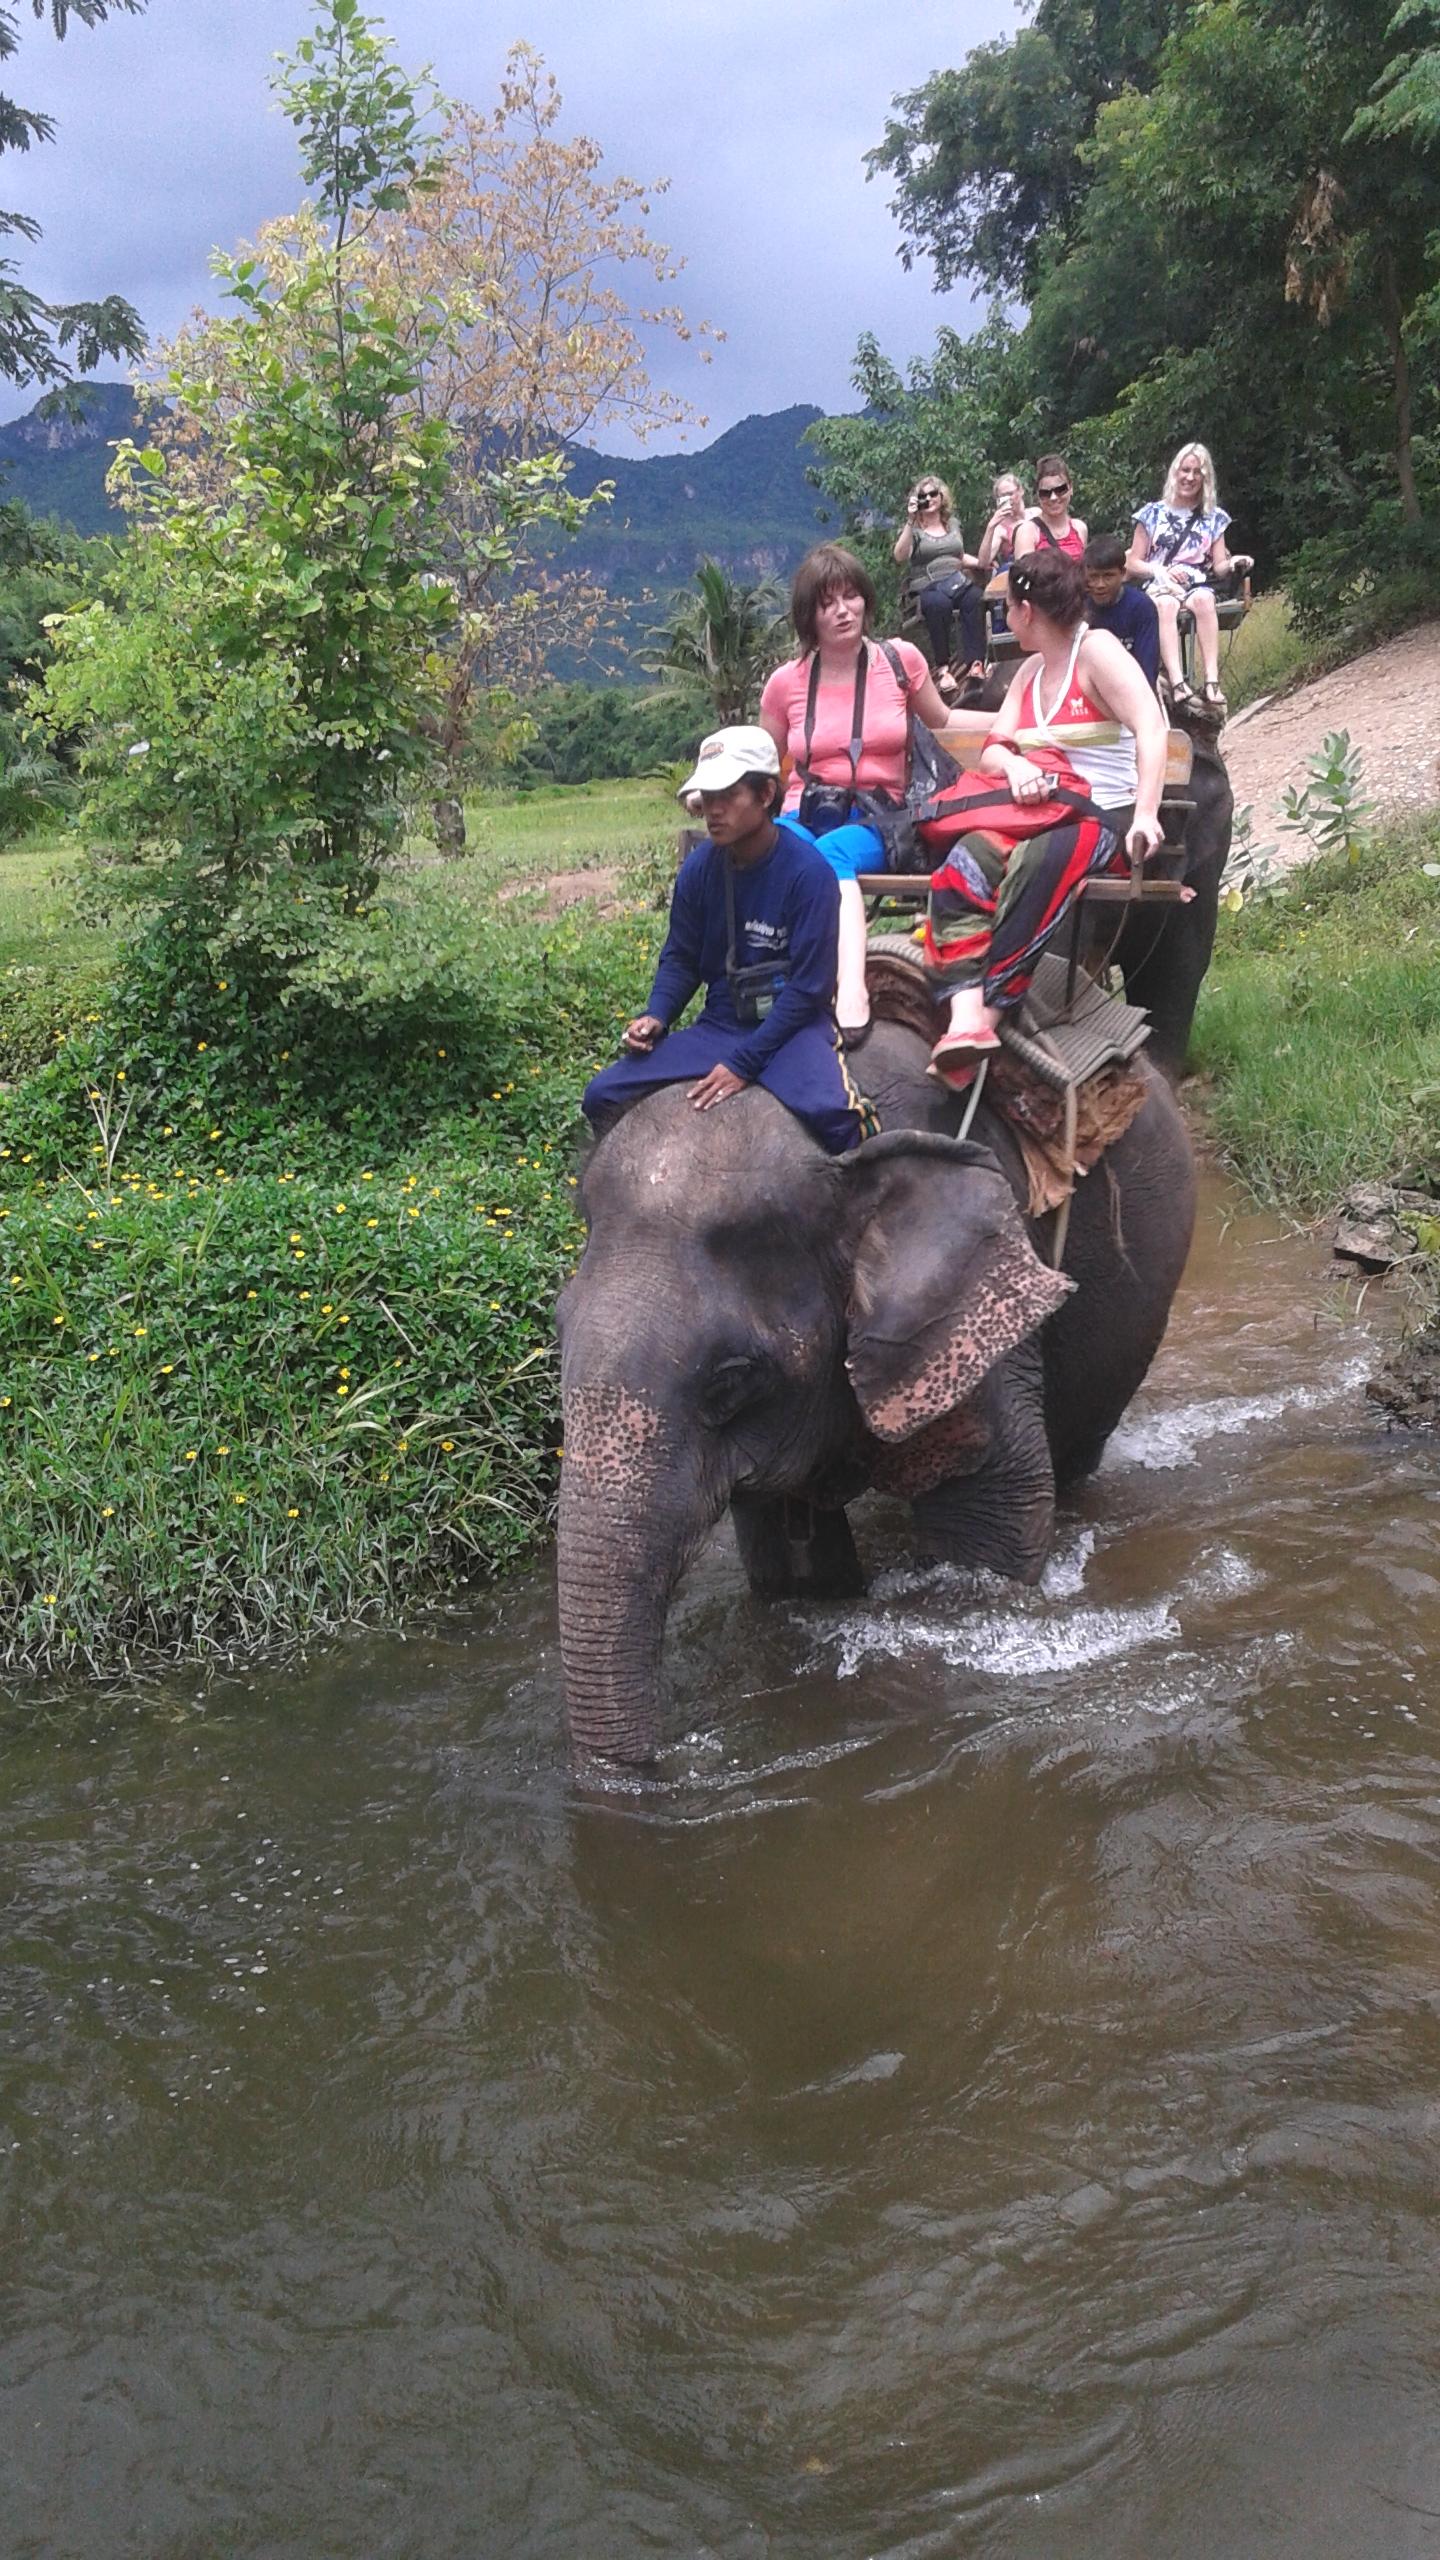 eff1de08bc9 17 juulikuist hetke Tais - Go Traveli reisikirjad: Reisiblogi